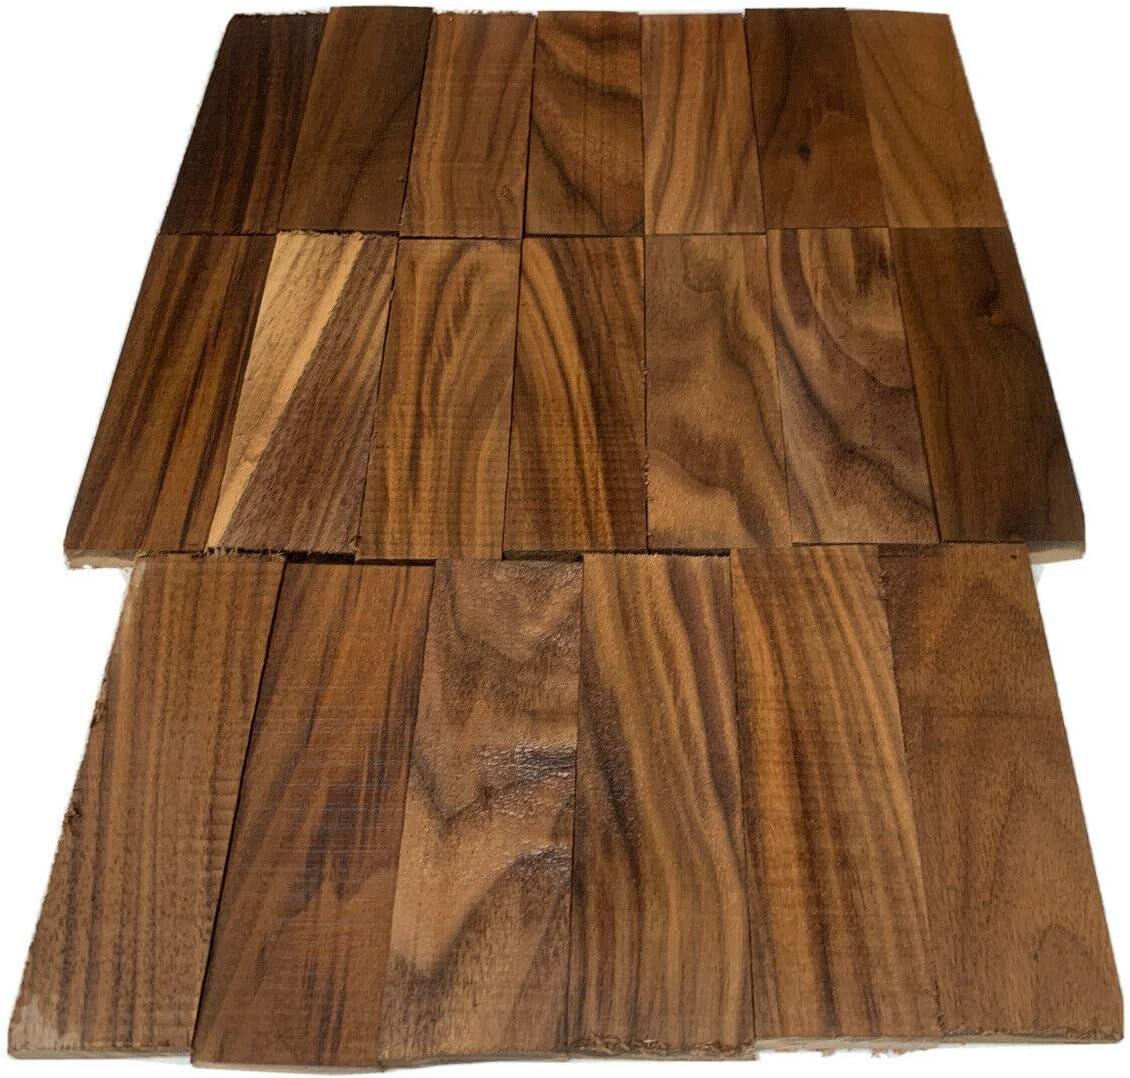 20 Pack, Black Walnut Wood Knife Scales